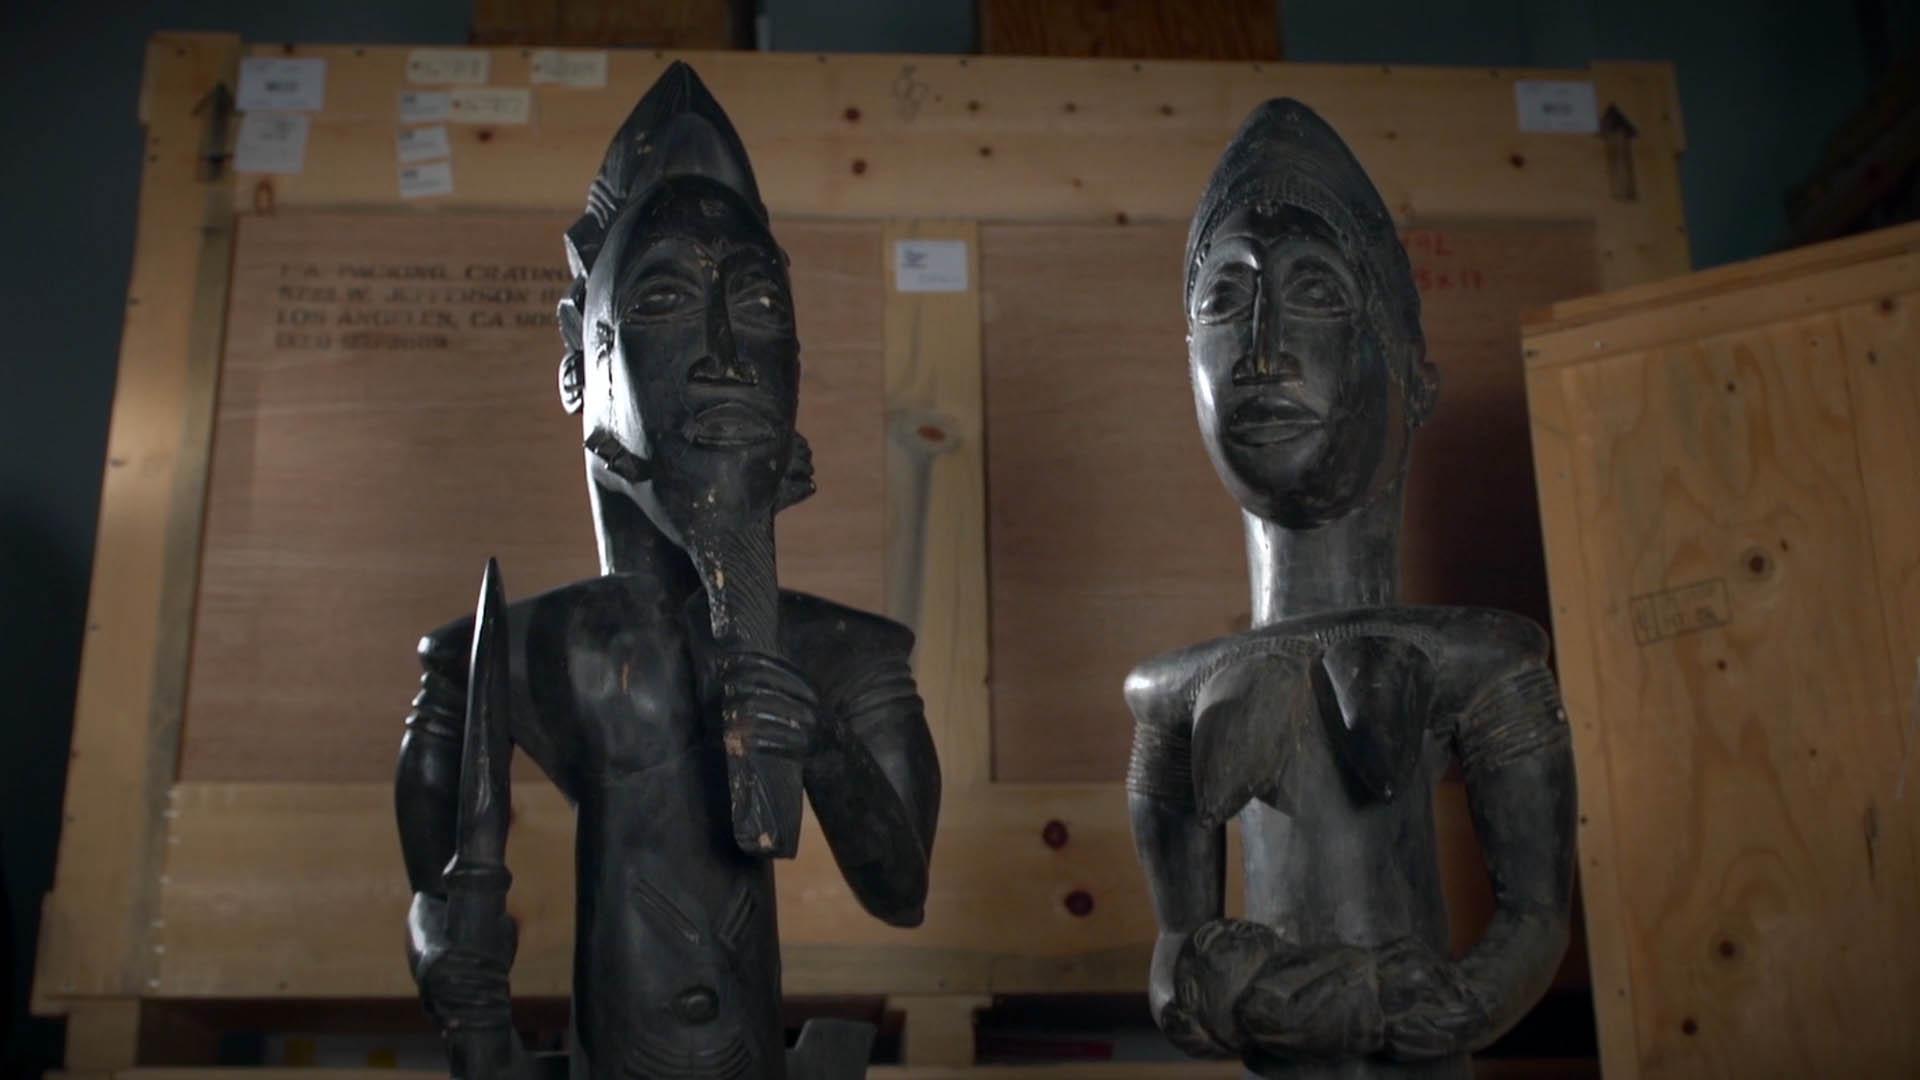 2 fertility statues